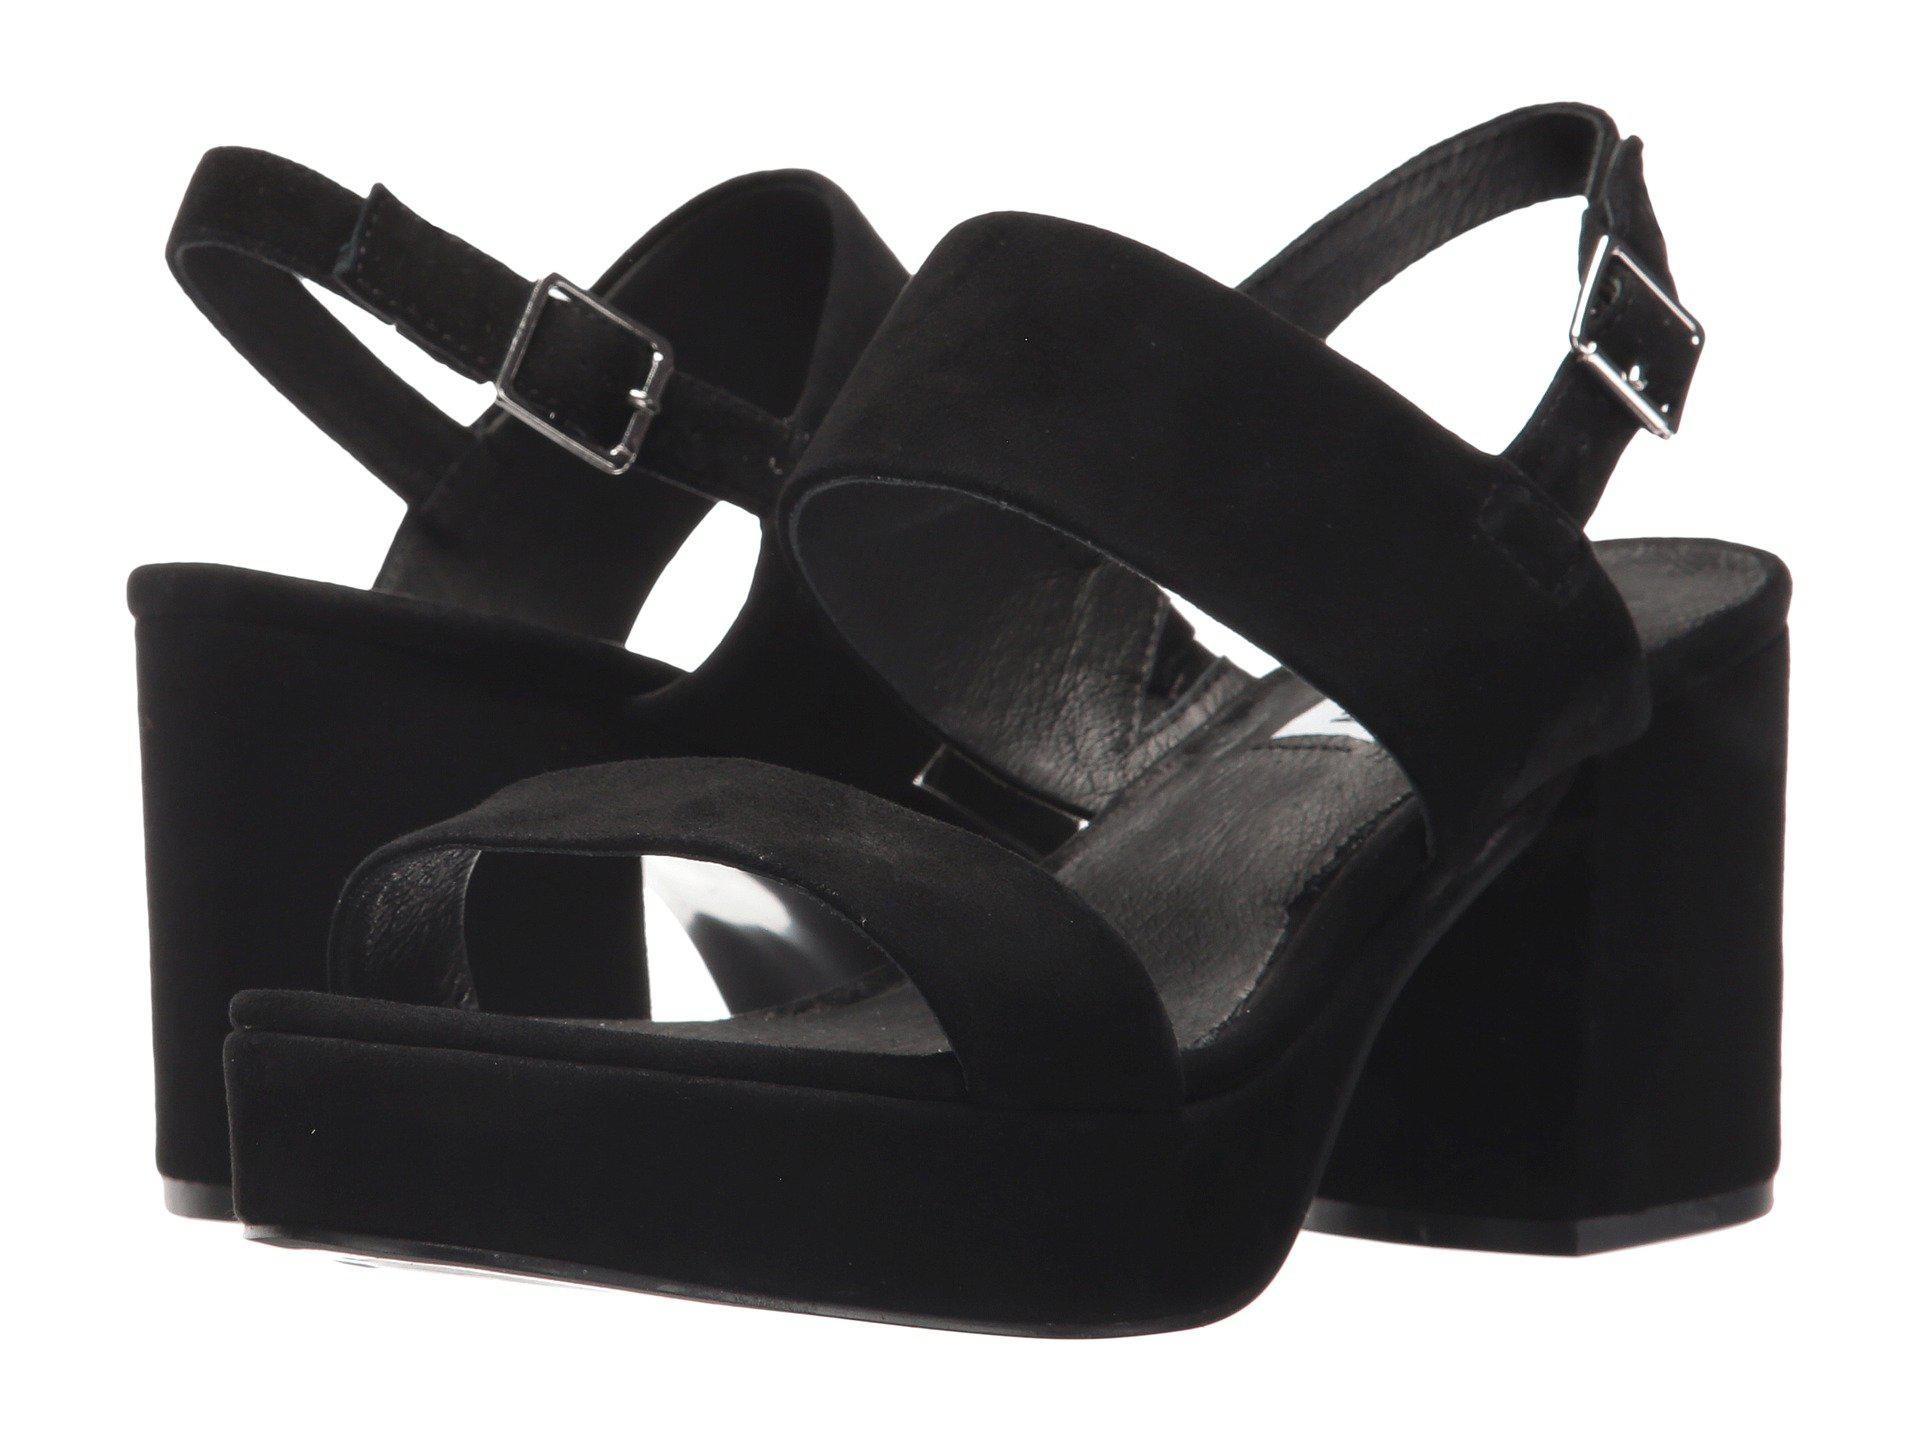 d111ca79a14a Lyst - Steve Madden Reba Sandal in Black